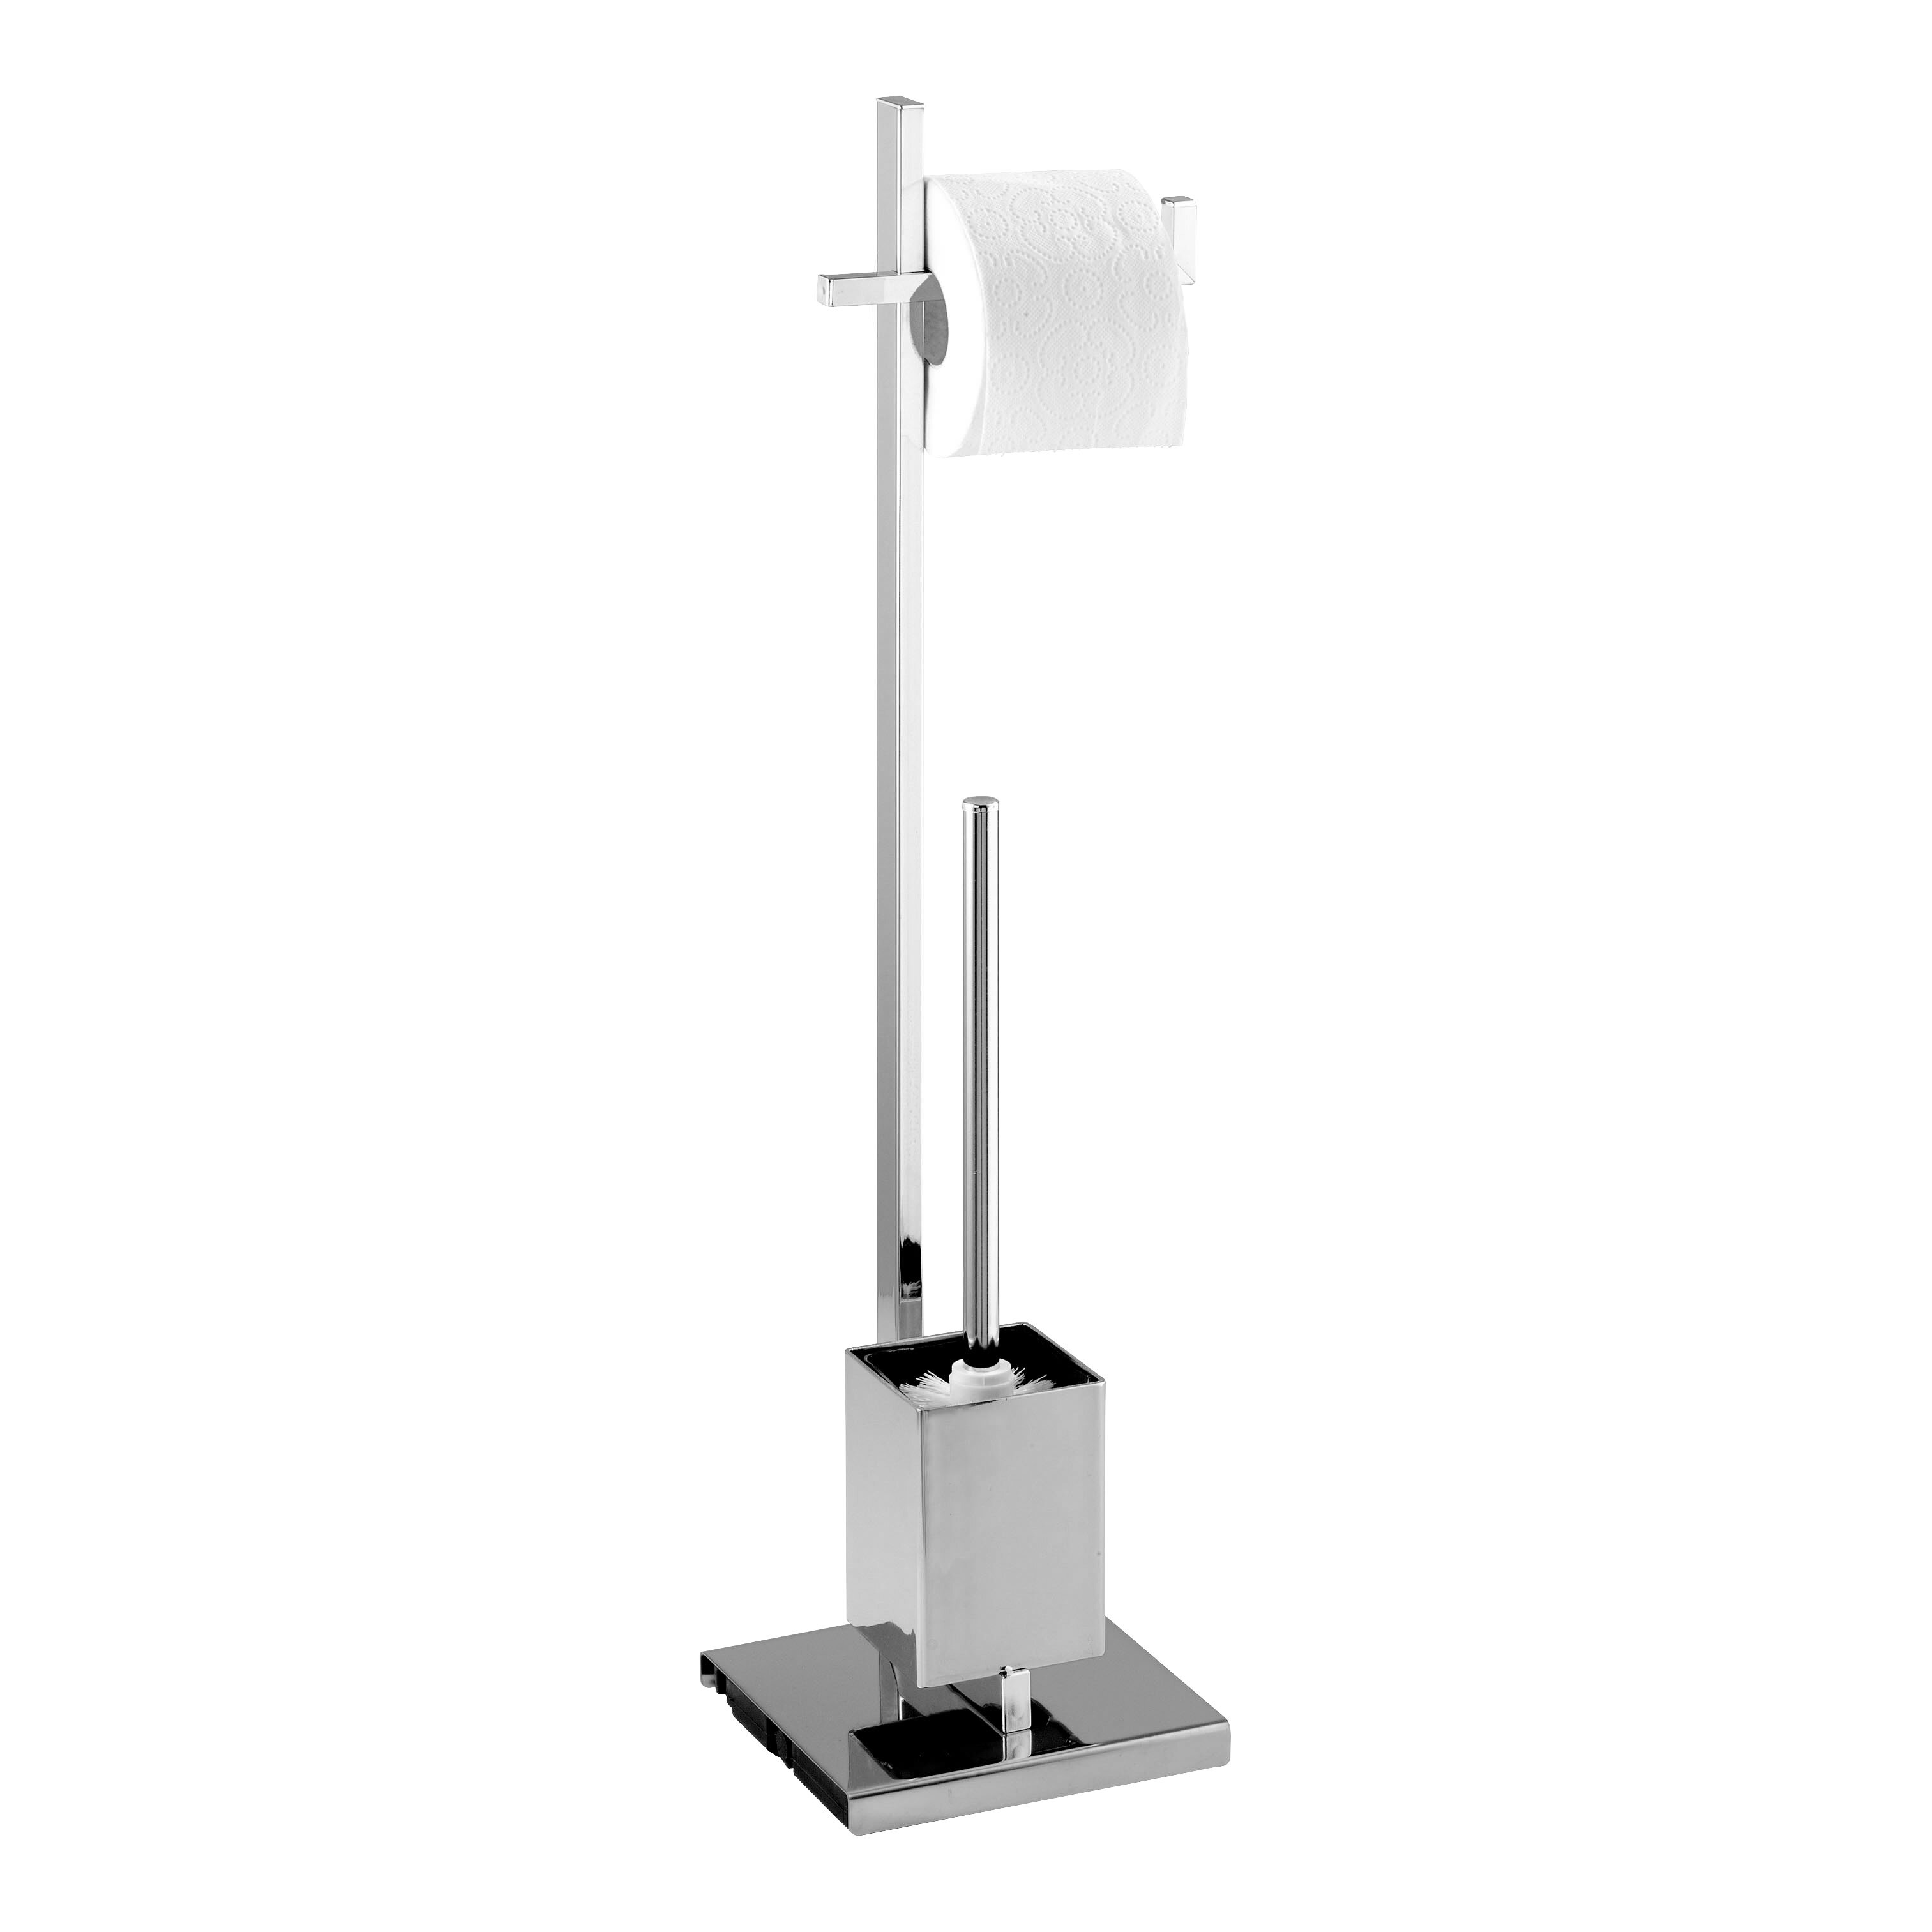 Wenko quadro free standing toilet roll and brush holder Glass toilet roll holder